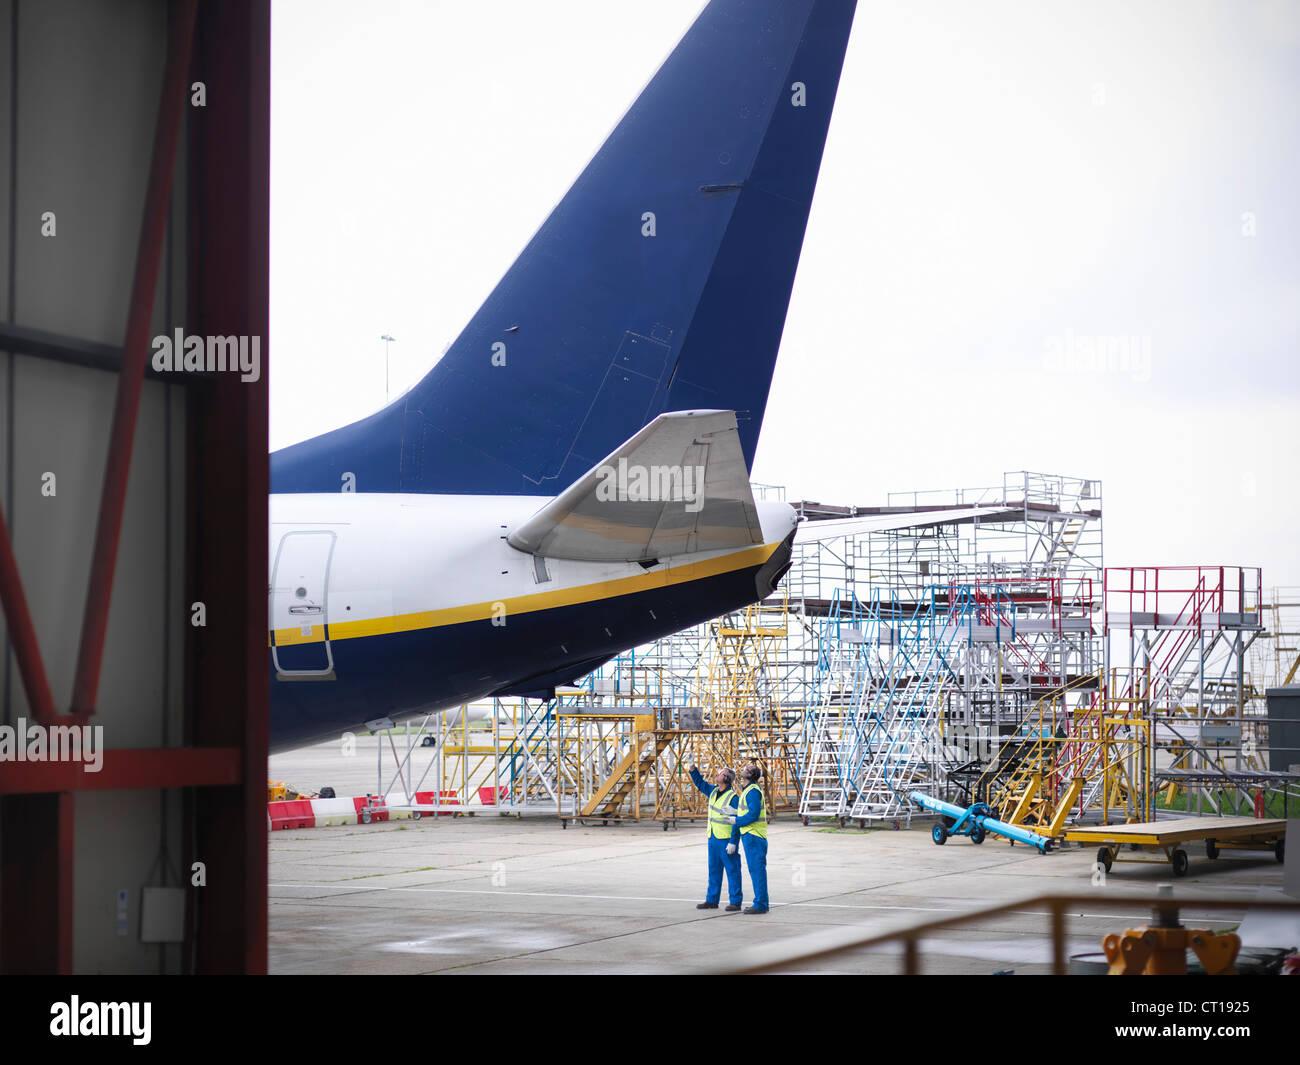 Workers examining underside of airplane - Stock Image